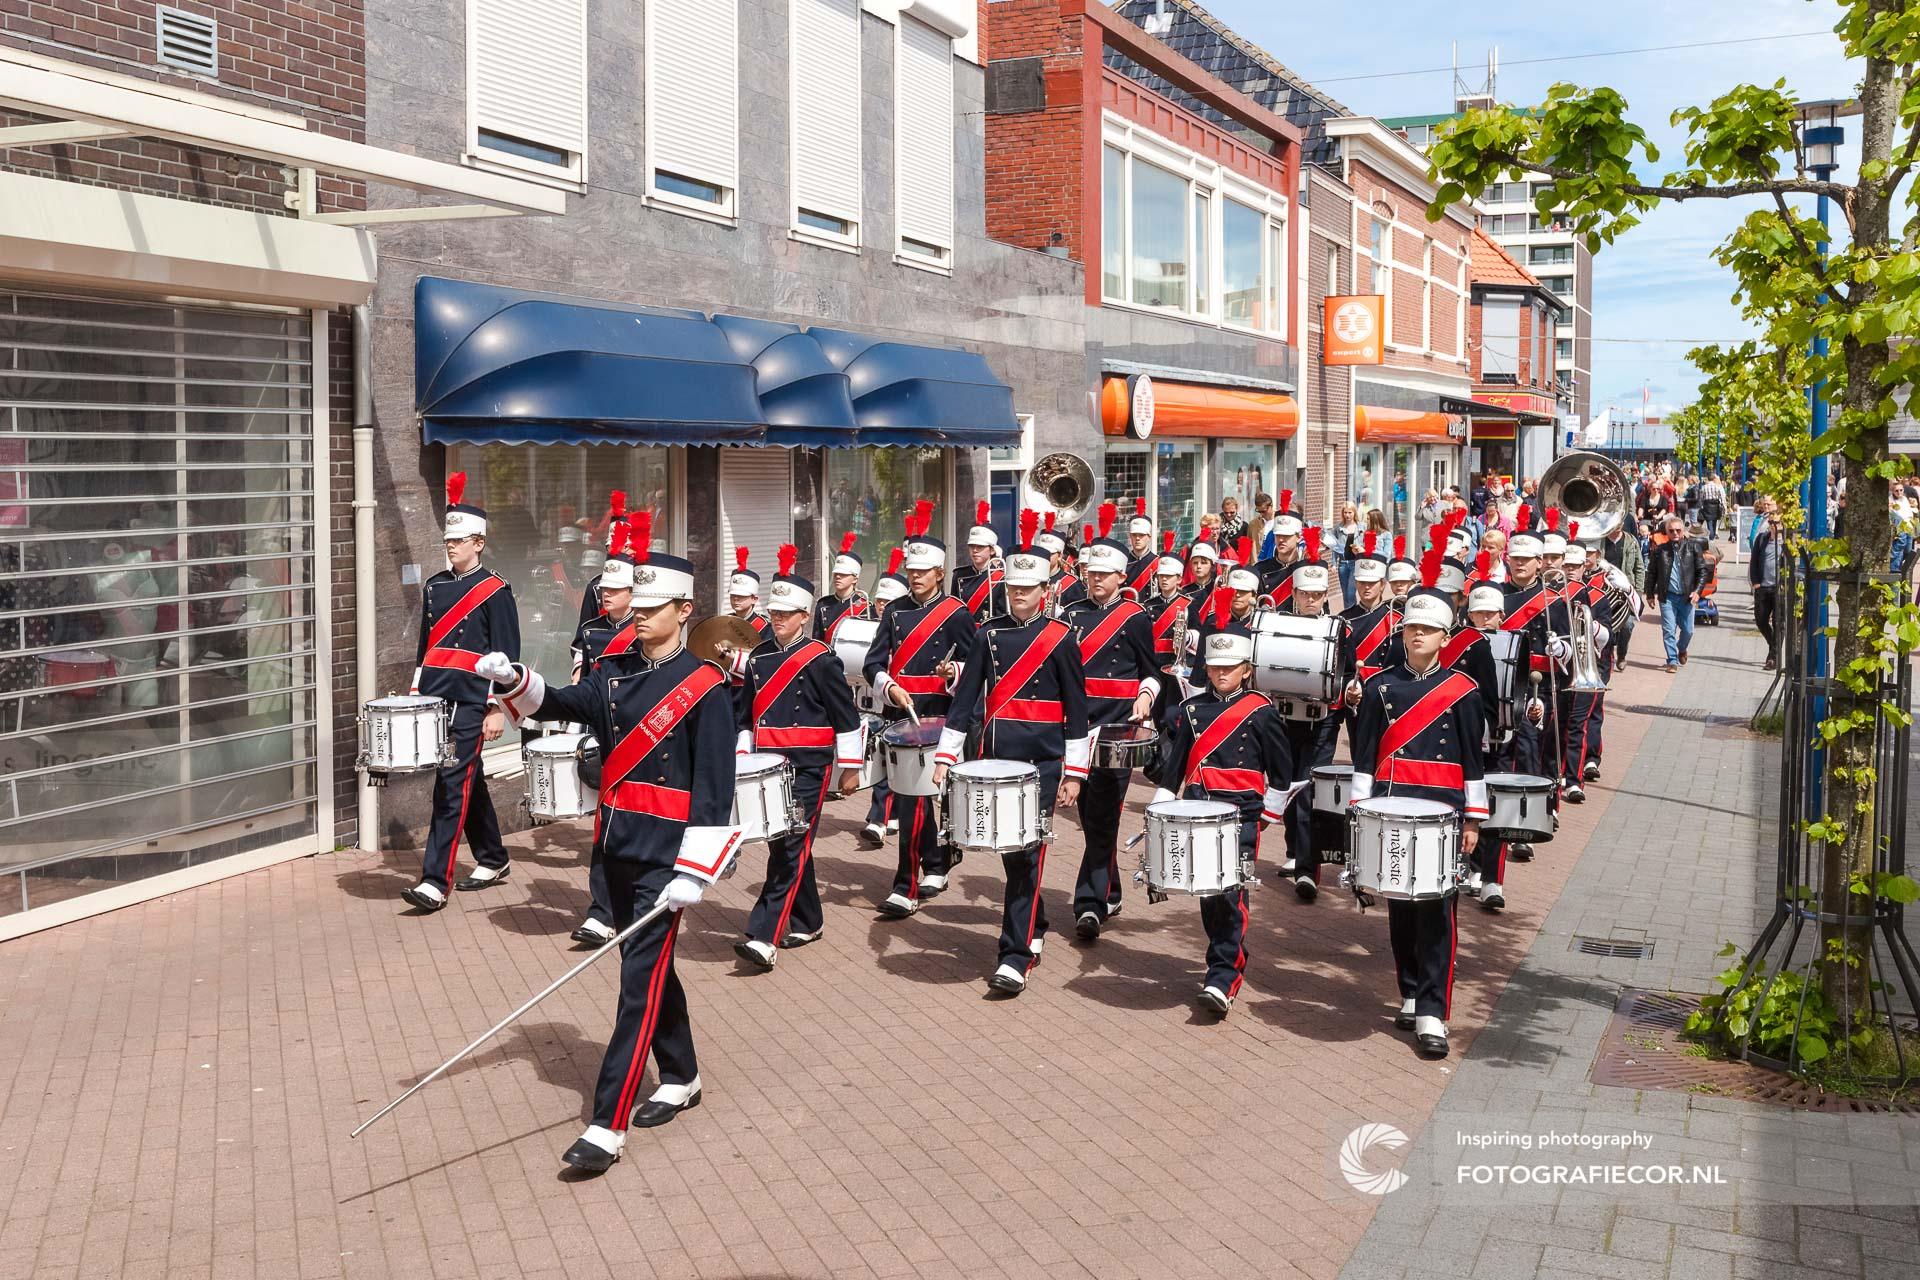 Jong-KTK| marchingband | fotograaf | fotografie © Fotografiecor.nl